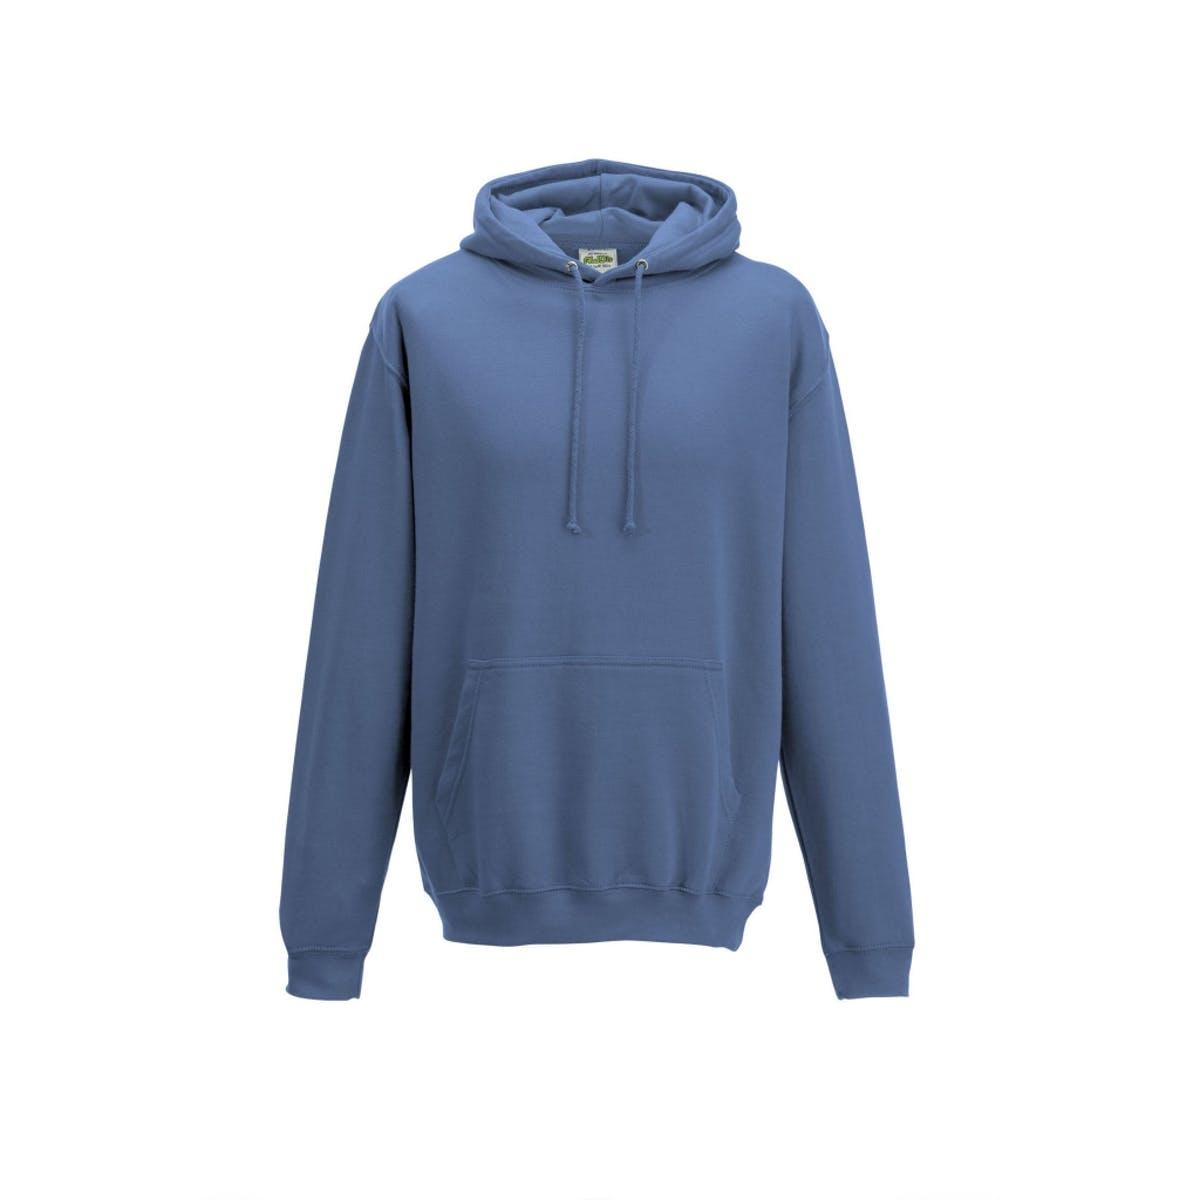 cornflower blue college hoodies